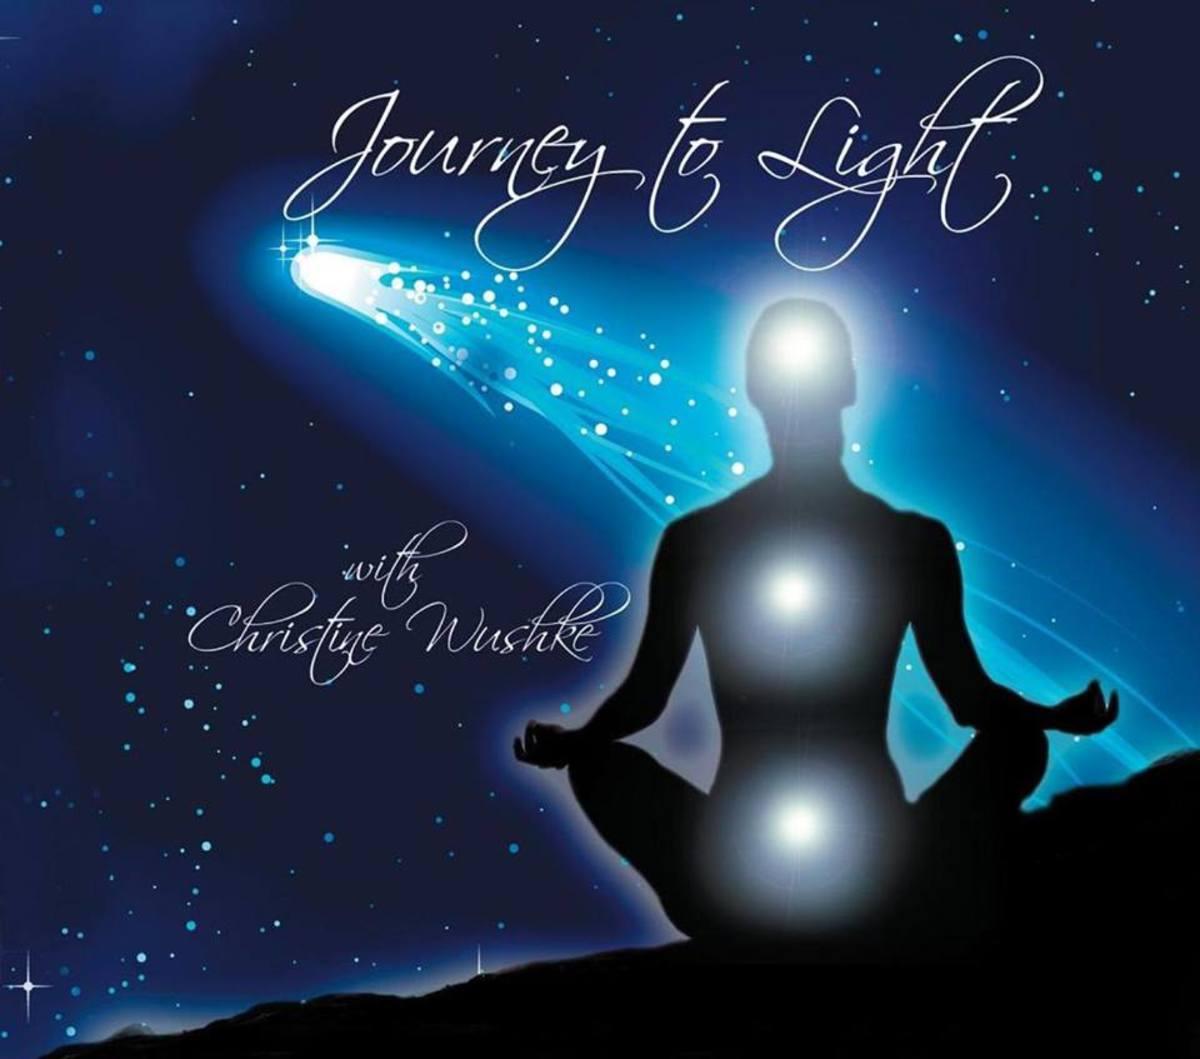 a-journey-to-light-tuesdays-inspiration-22-to-my-friend-rosina-khan